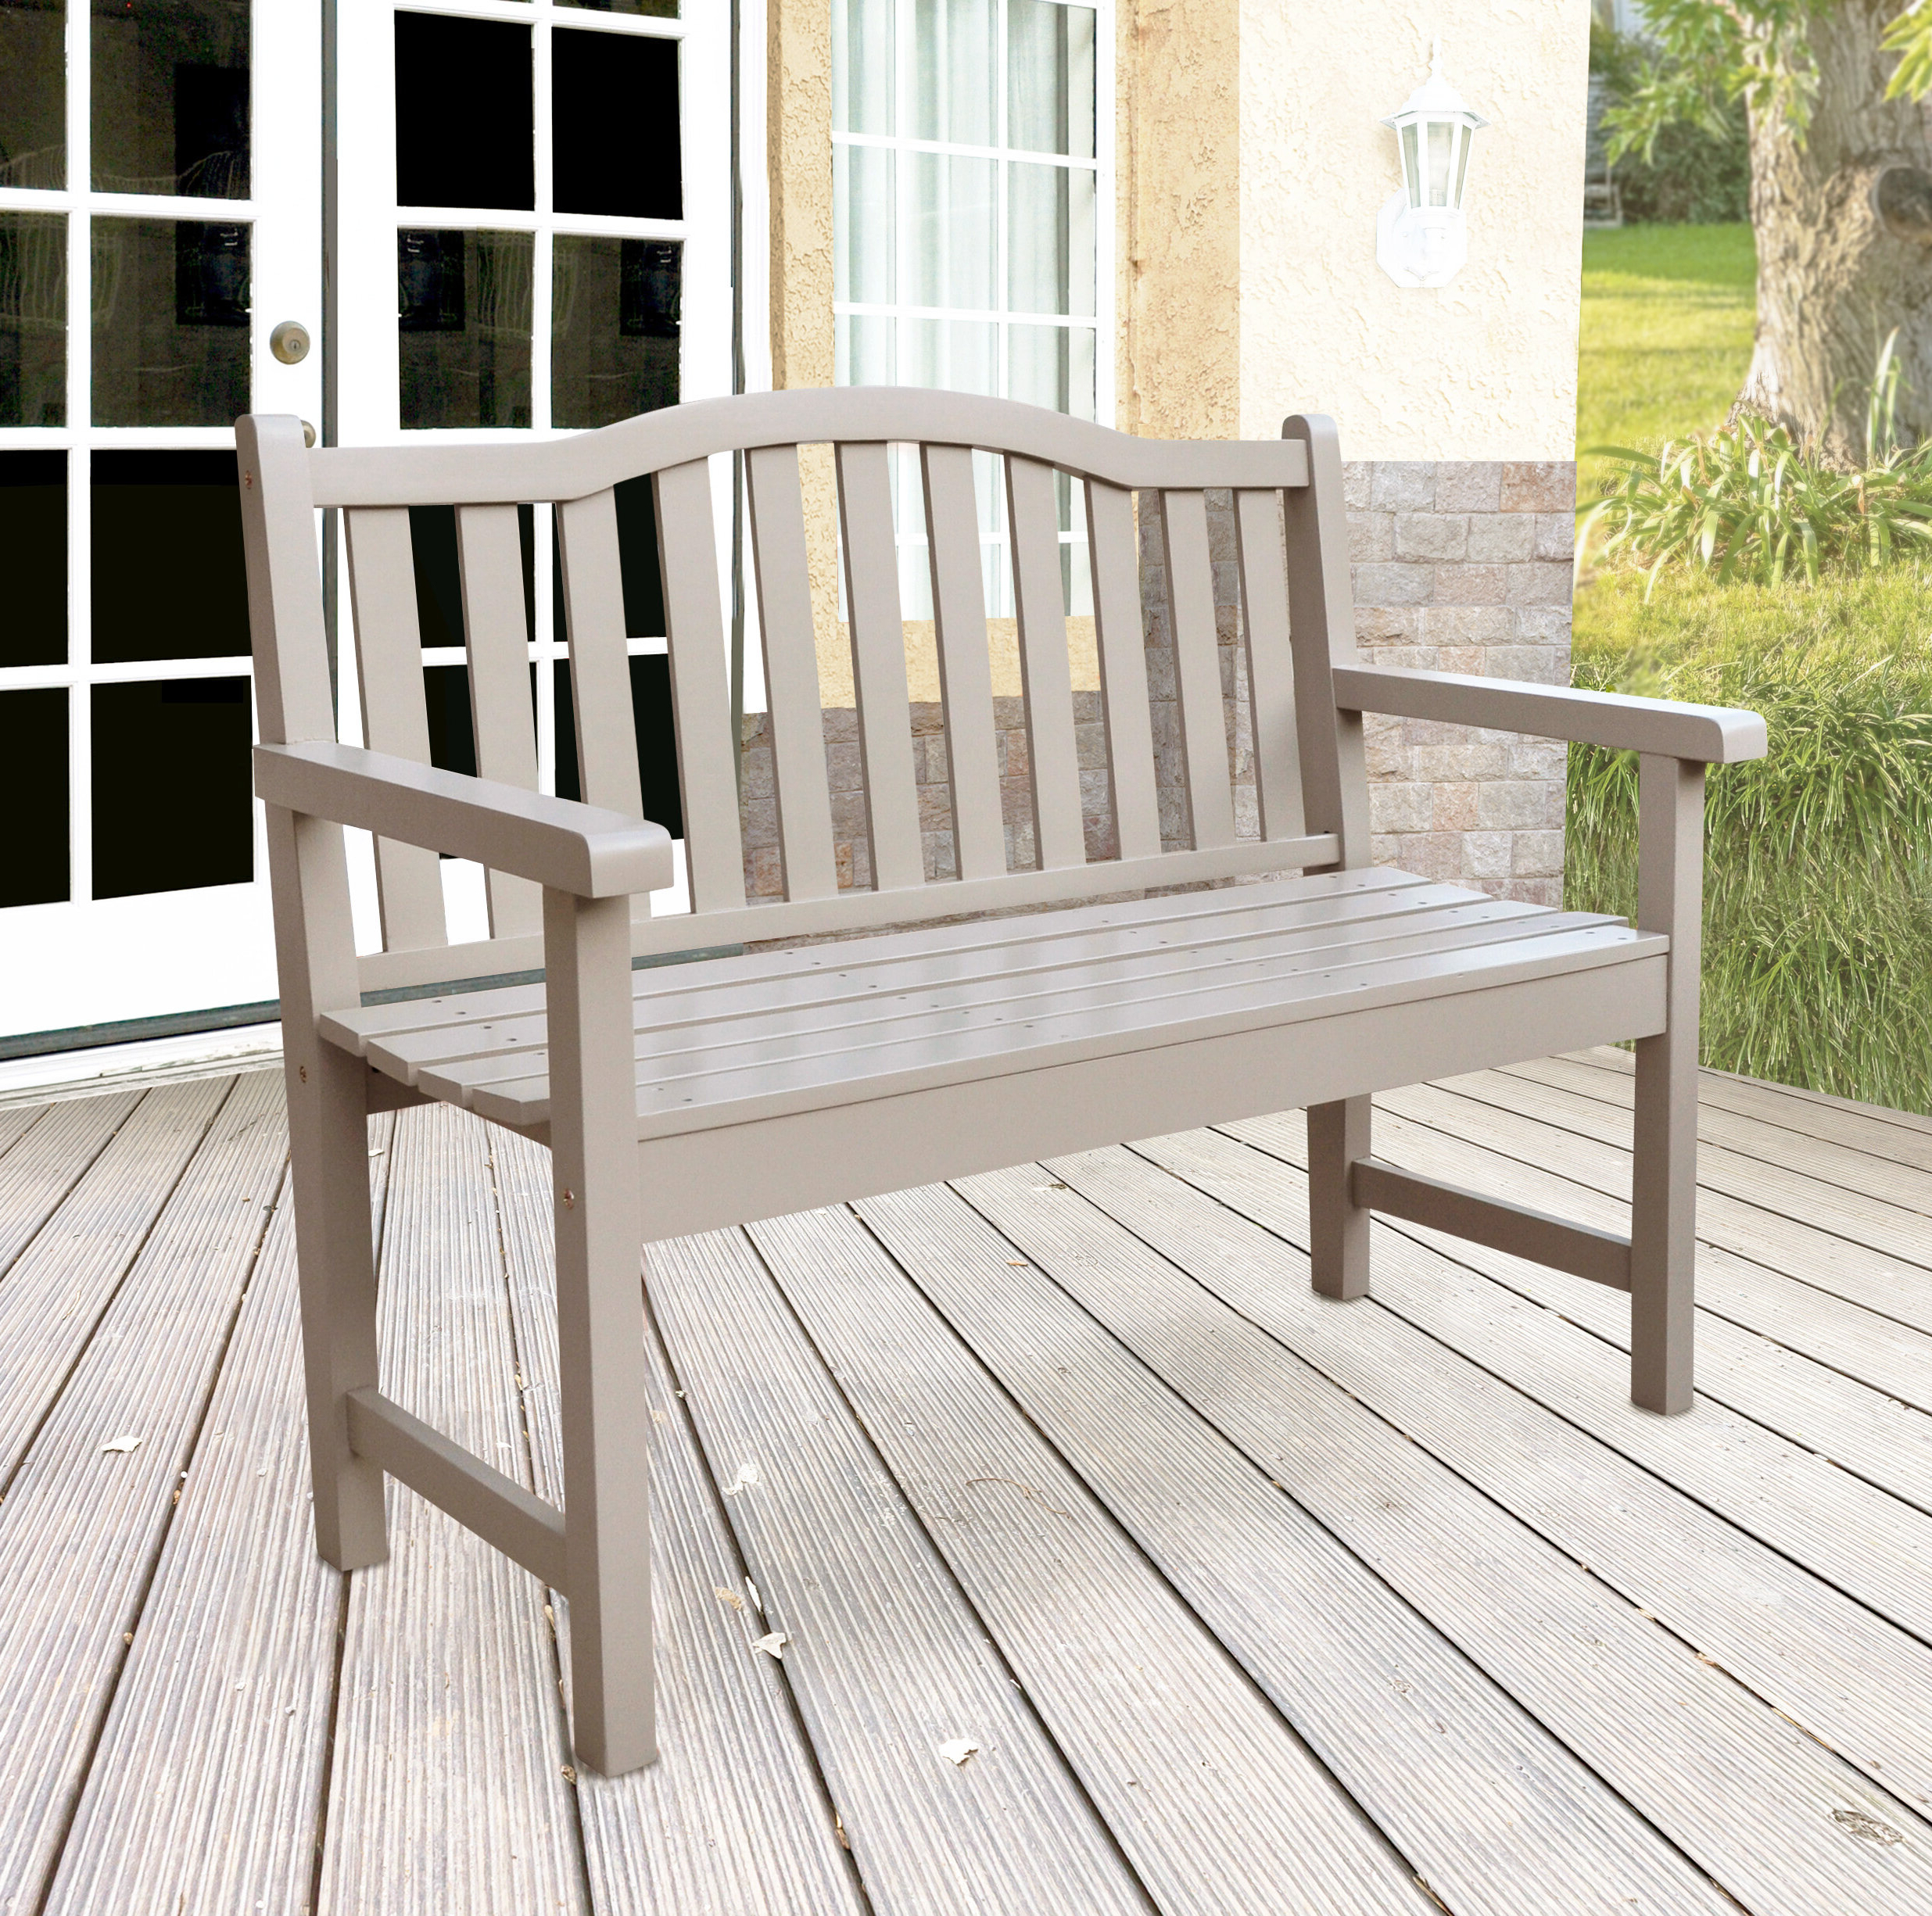 Belfort Cedar Garden Bench Intended For Well Liked Harpersfield Wooden Garden Benches (View 14 of 30)